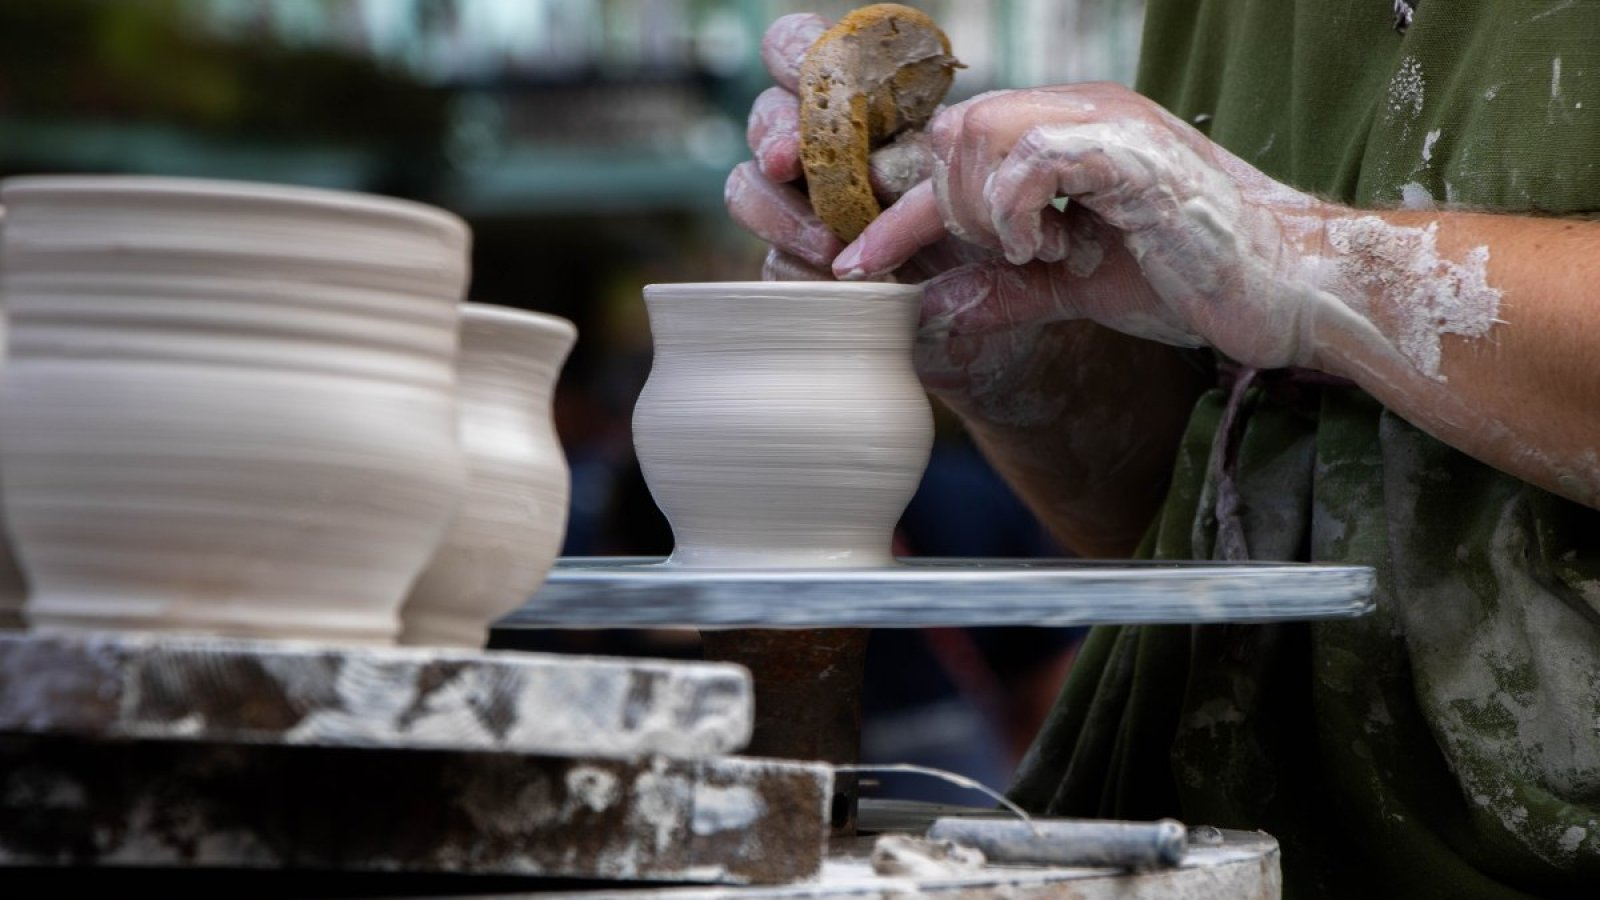 """Renaissance employee making pottery on school days"" by Daphney Hernandez, Navasota HS, Feature Photo, 2nd Place"